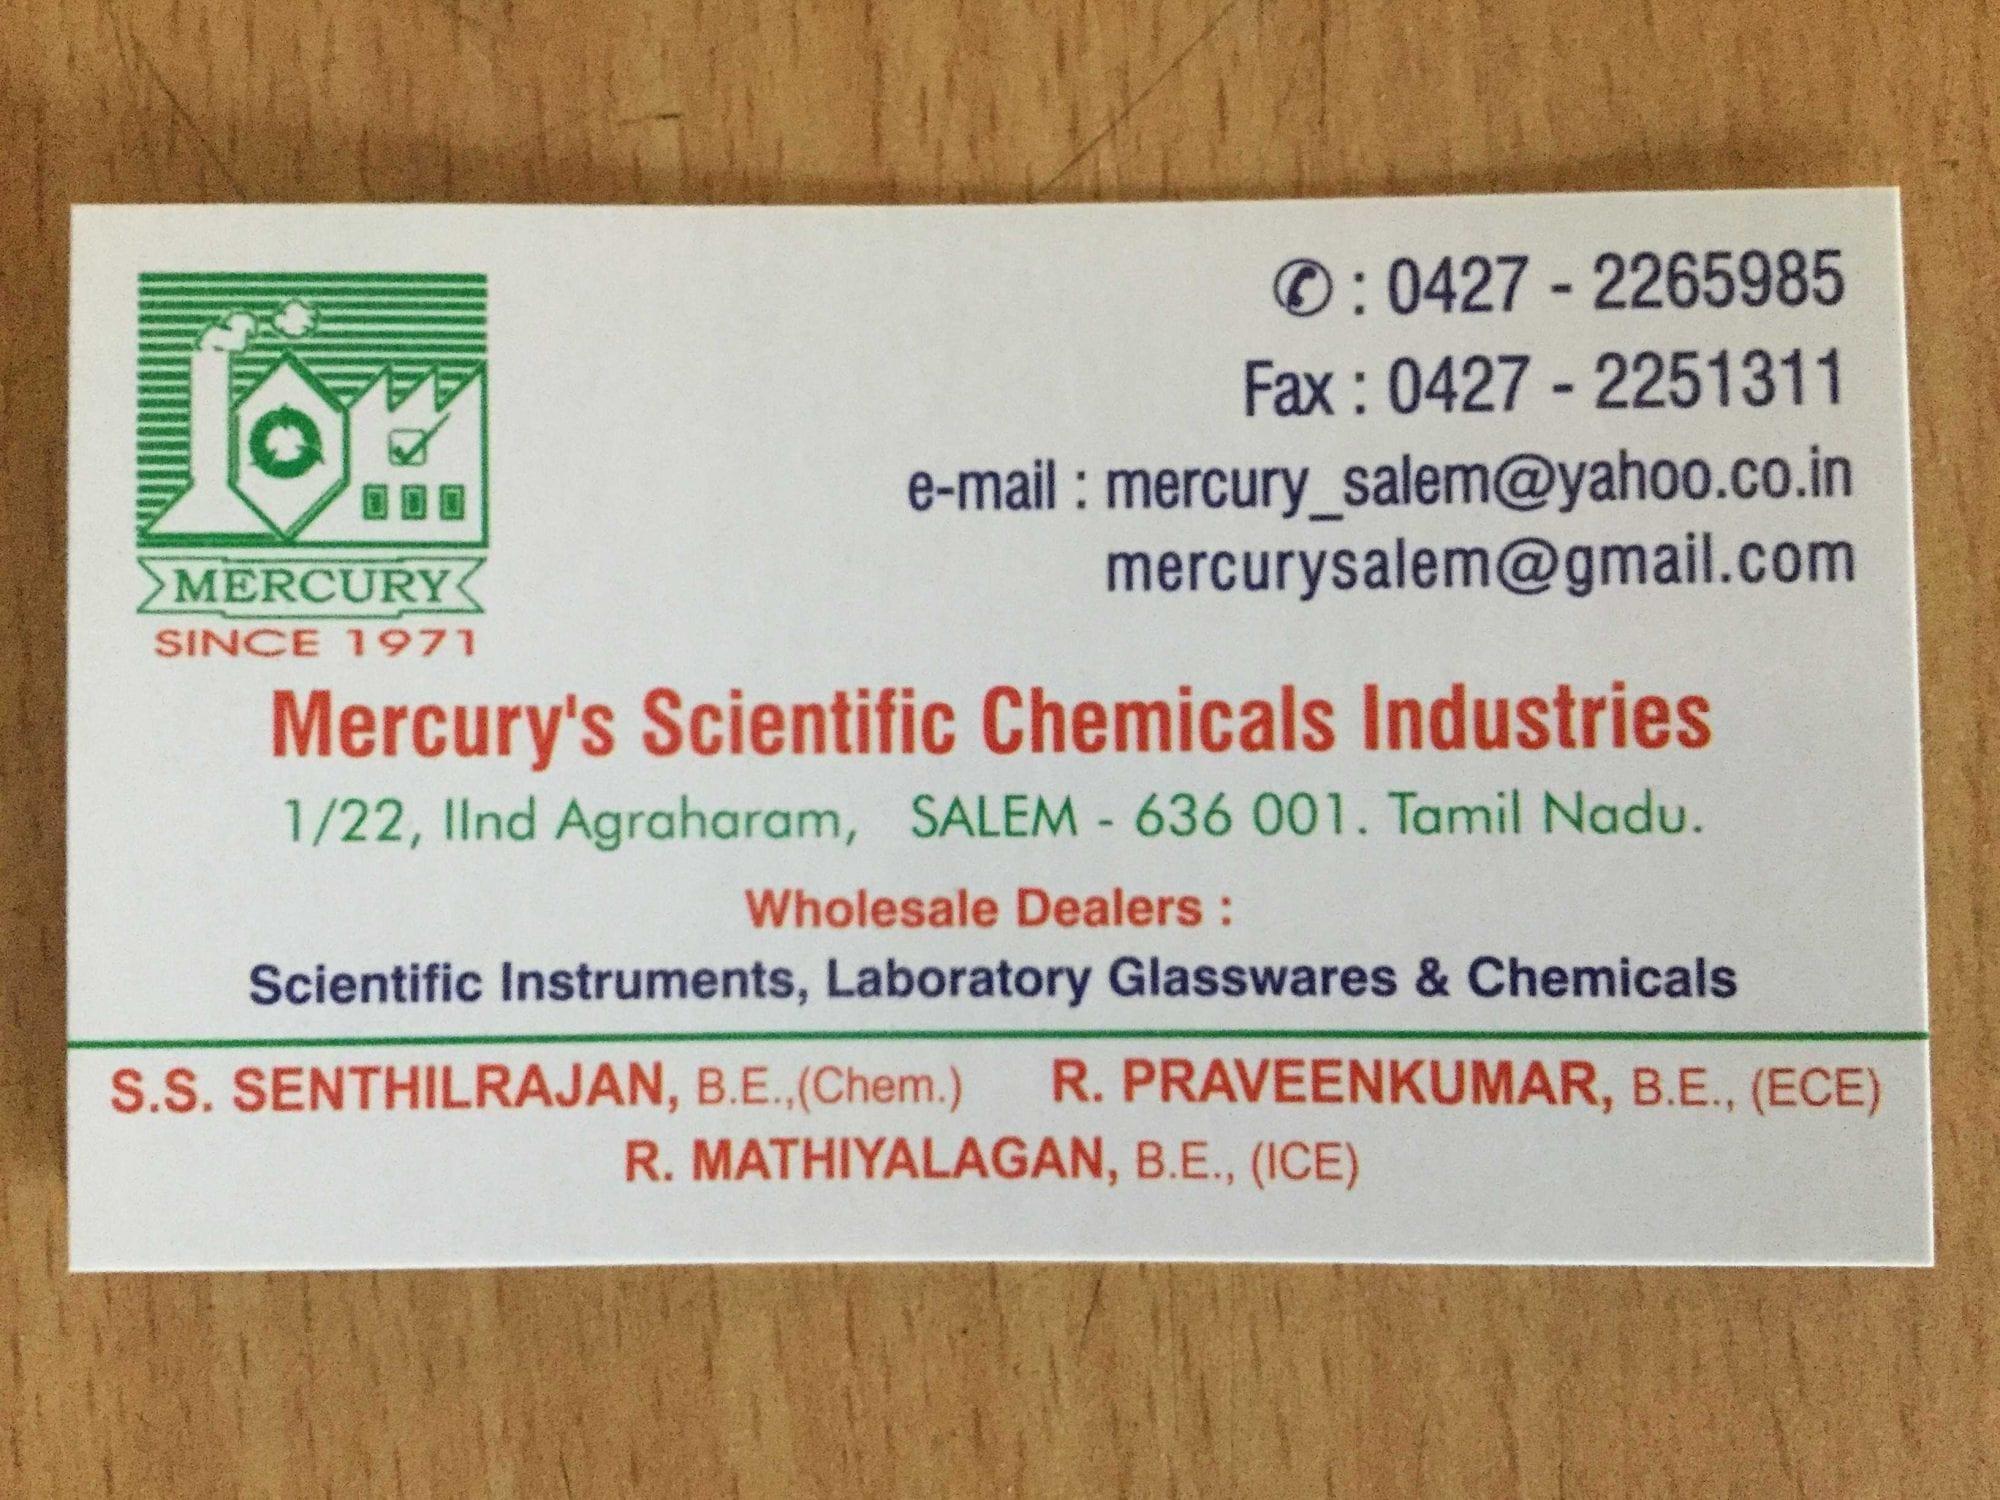 Mercurys scientific chemicals industries laboratory equipment mercurys scientific chemicals industries laboratory equipment dealers in salem justdial buycottarizona Choice Image